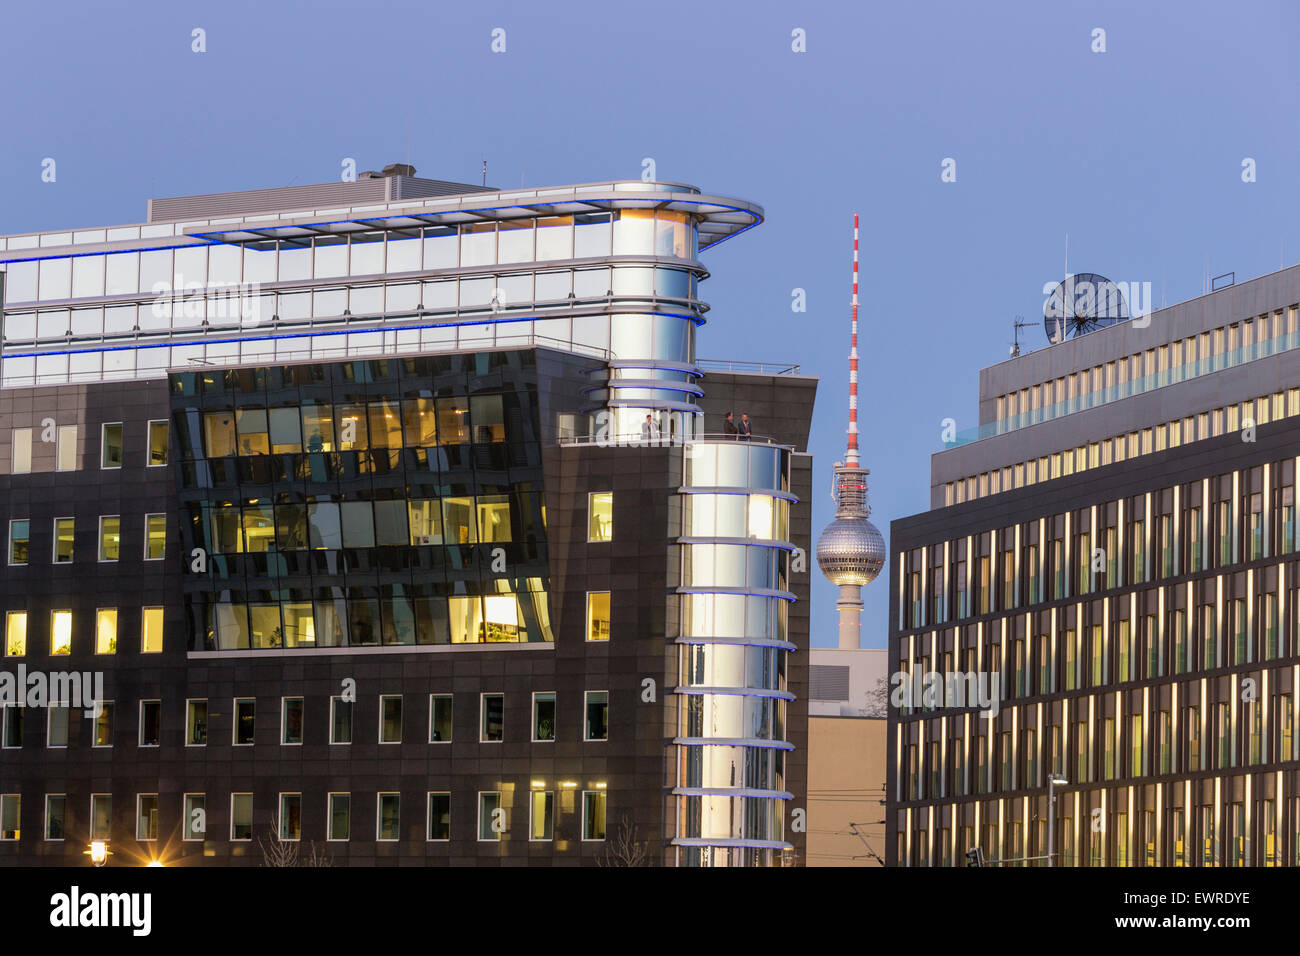 Architettura moderna, Alex TV Tower, Berlin , Germania Immagini Stock